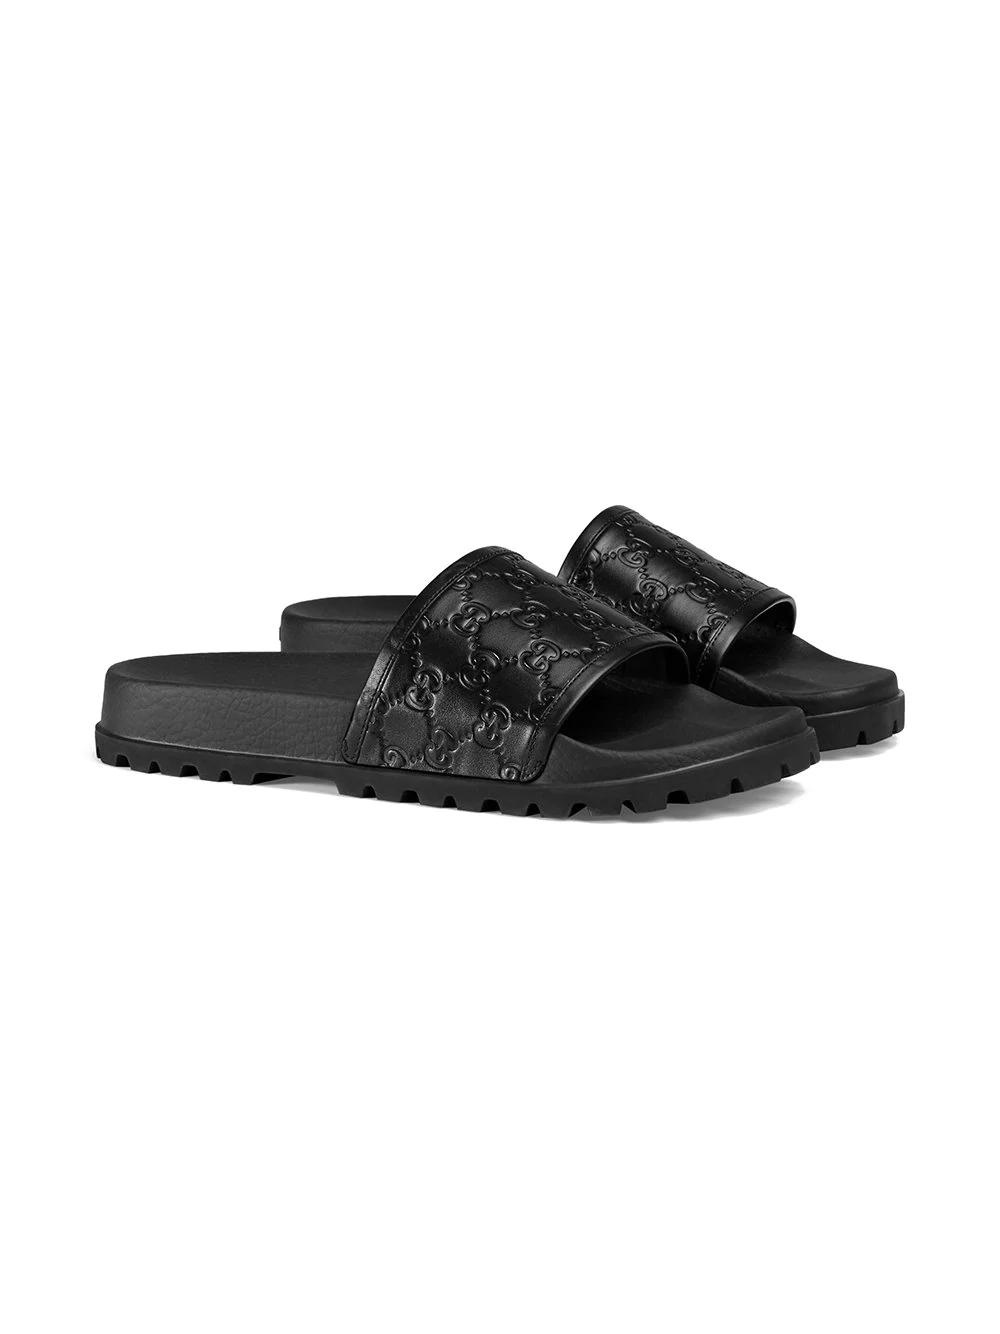 4bd37b8d624 Gucci Pursuit Trek Leather Slider Sandals In 1000 Black